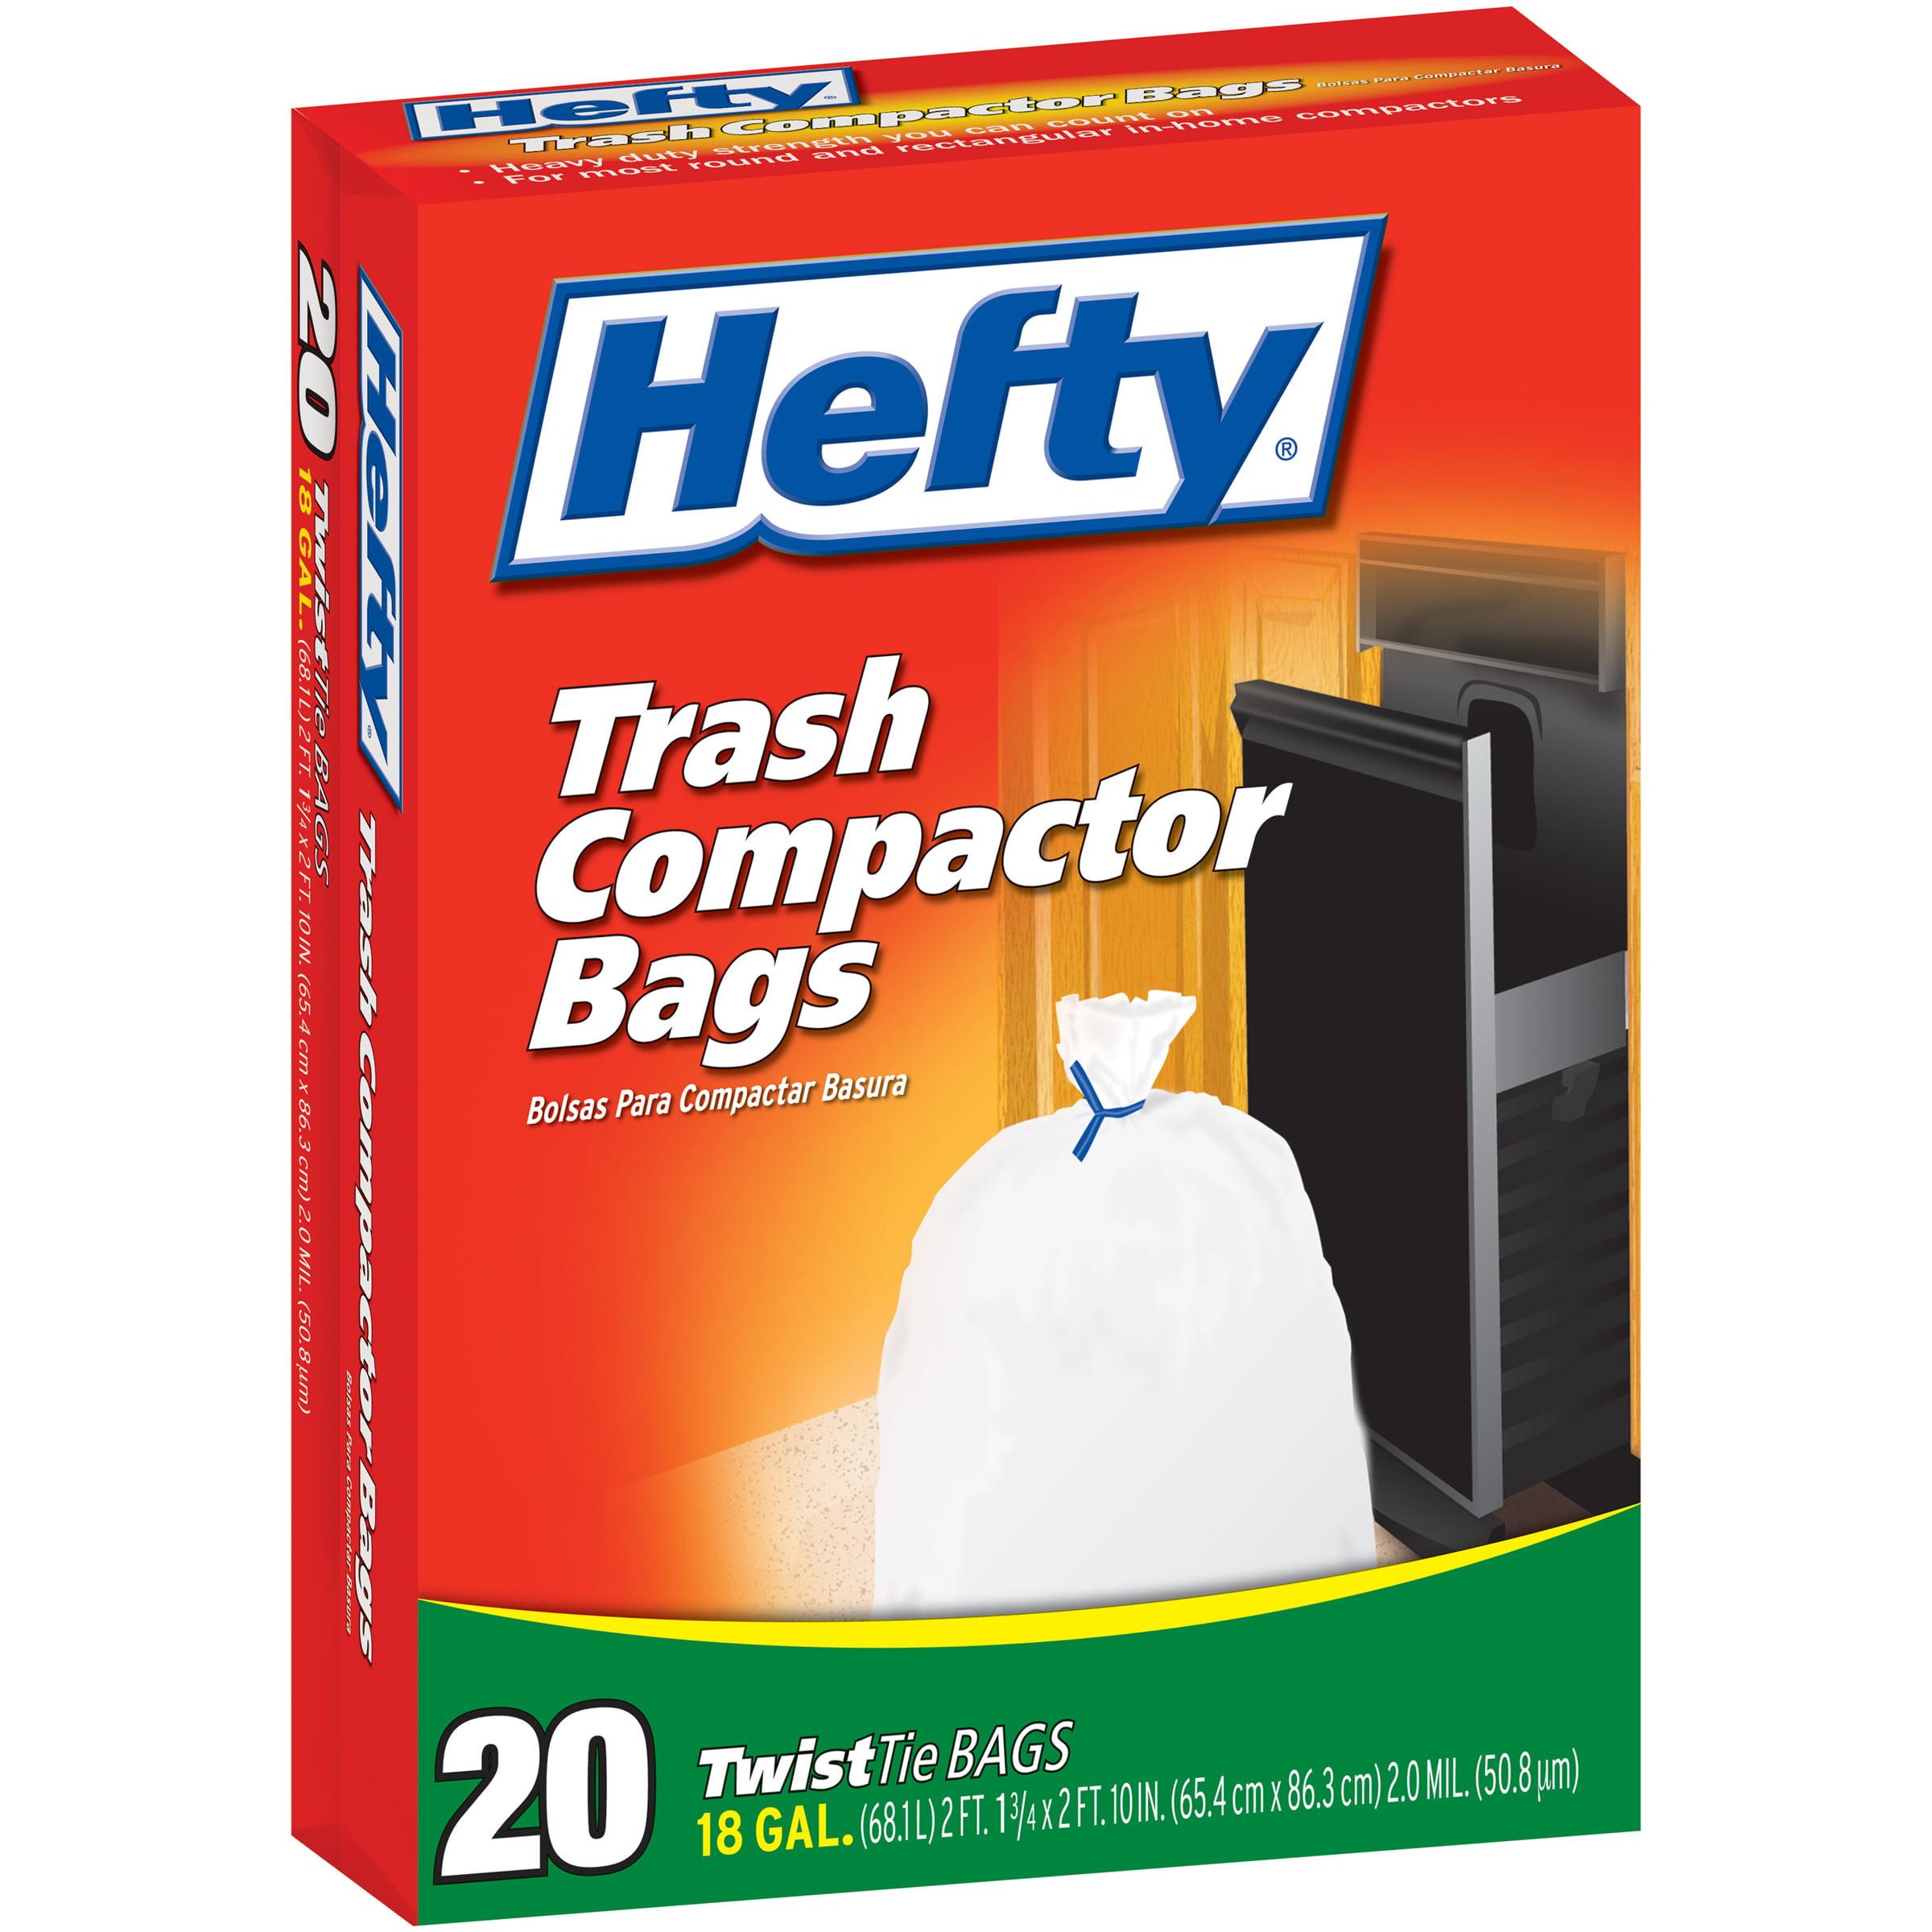 HEFTY TWISTTIE Trash Compactor 18 Gallon Trash Bags 20 CT BOX